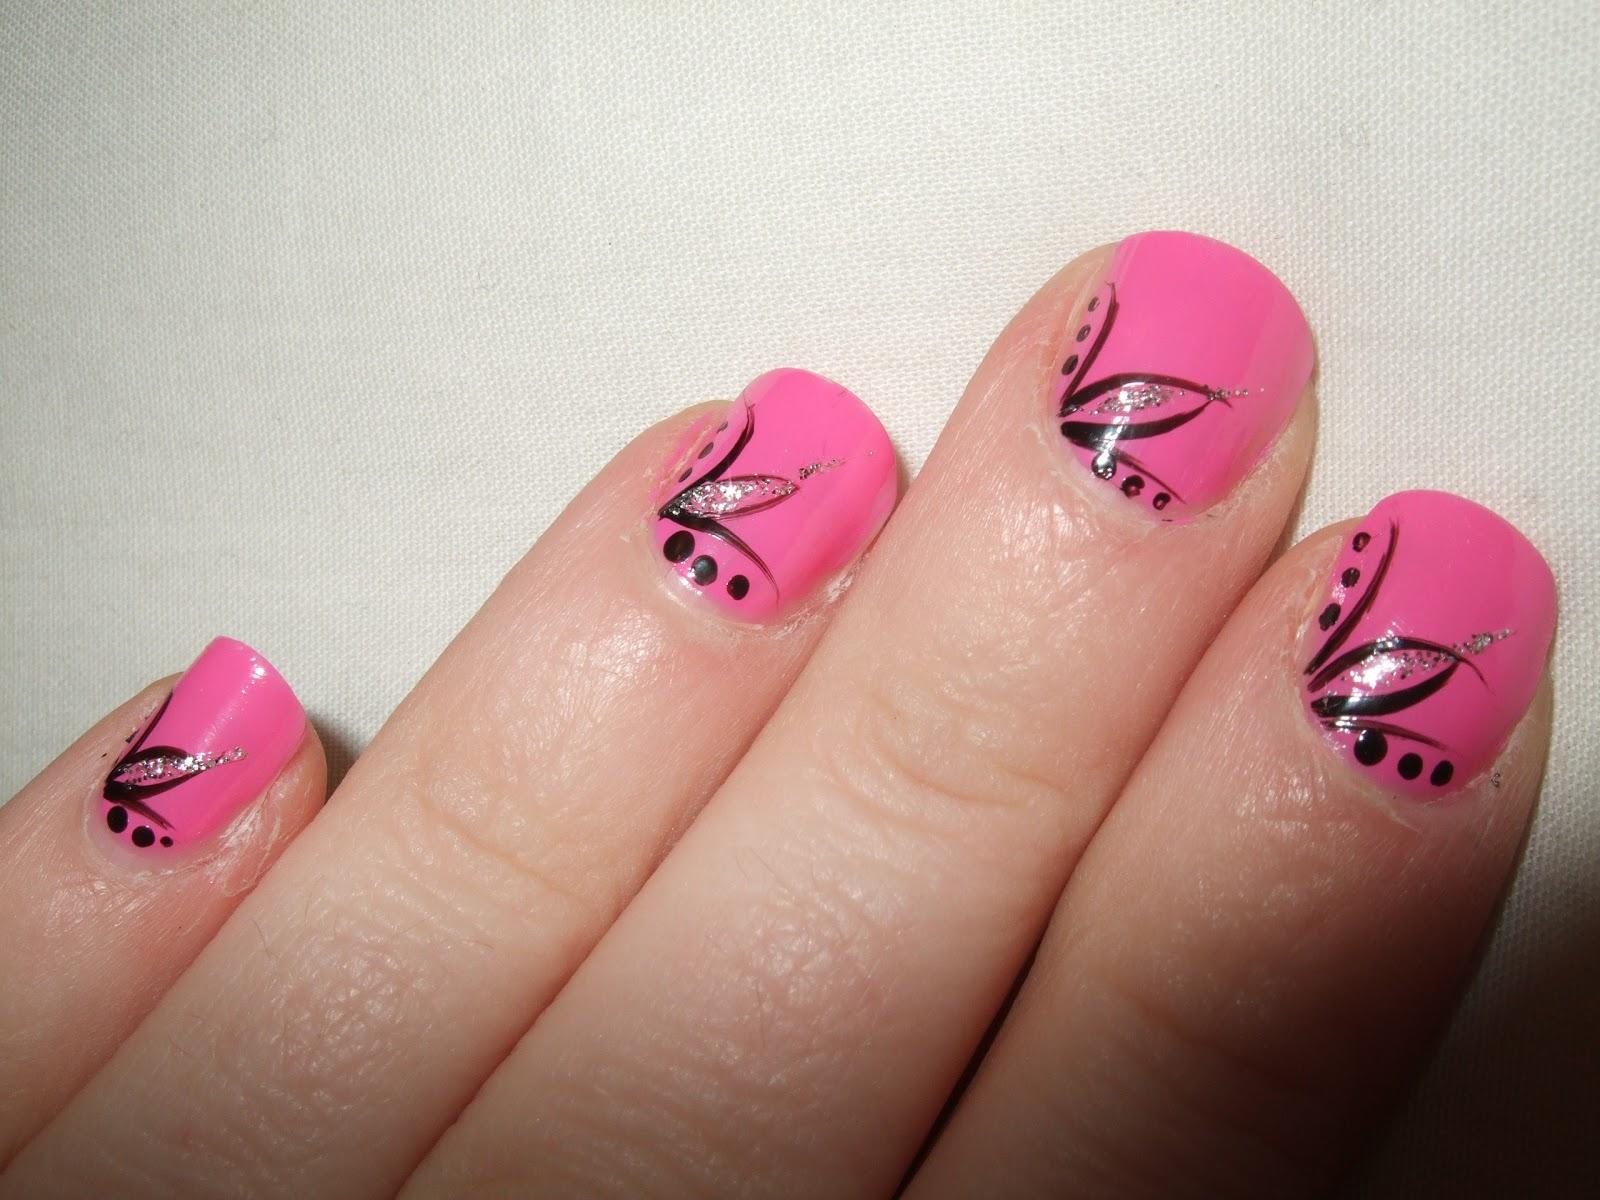 13 Pretty Nail Art Designs Images Cute Acrylic Nail Art Designs Pretty Nail Design Ideas For